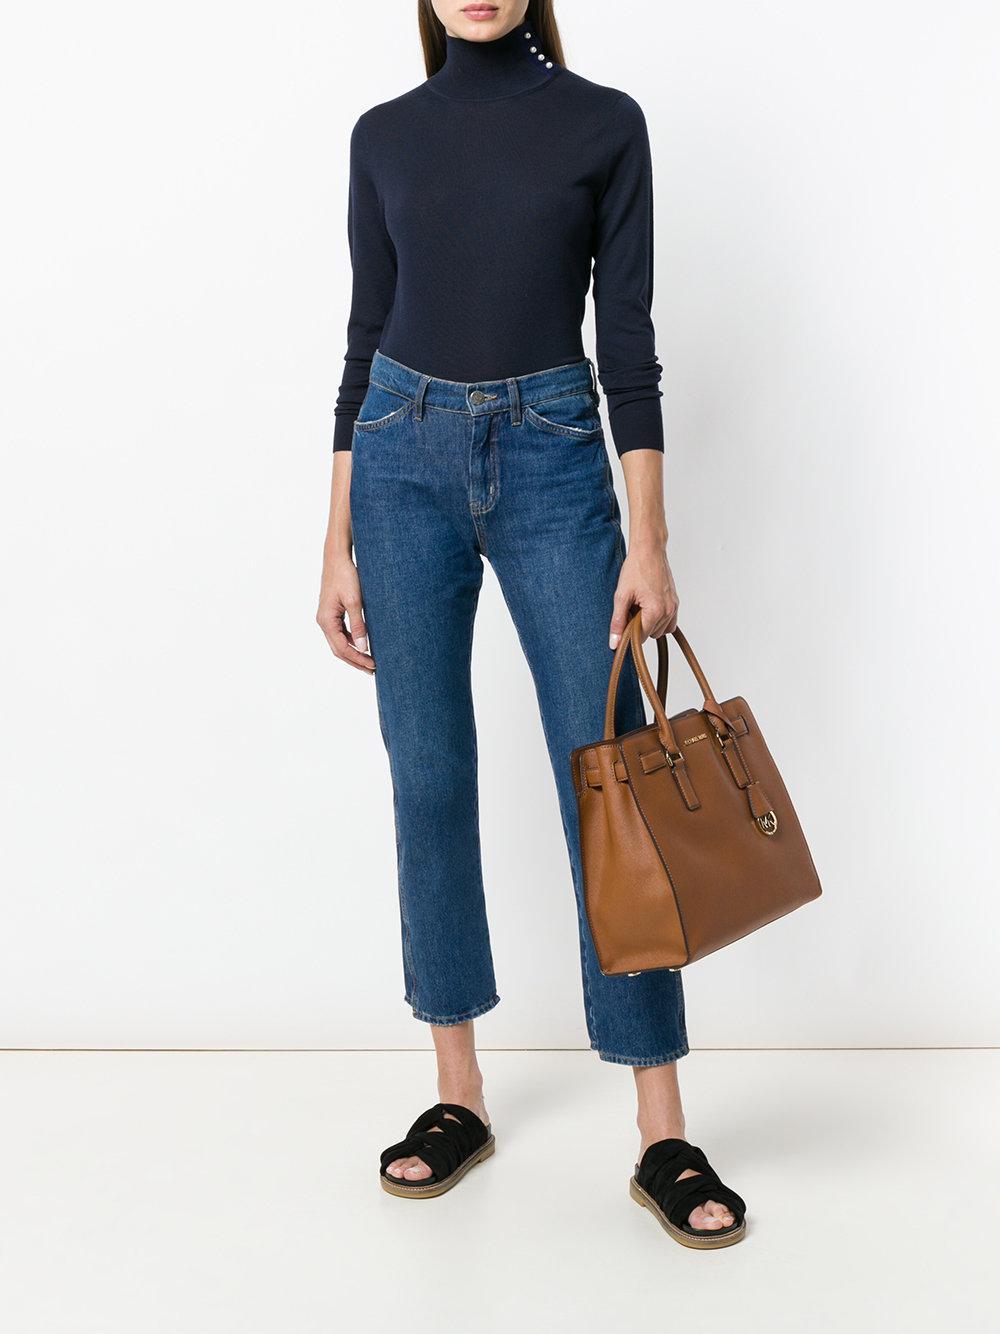 MICHAEL Michael Kors Leather Dillon Tote Bag in Brown